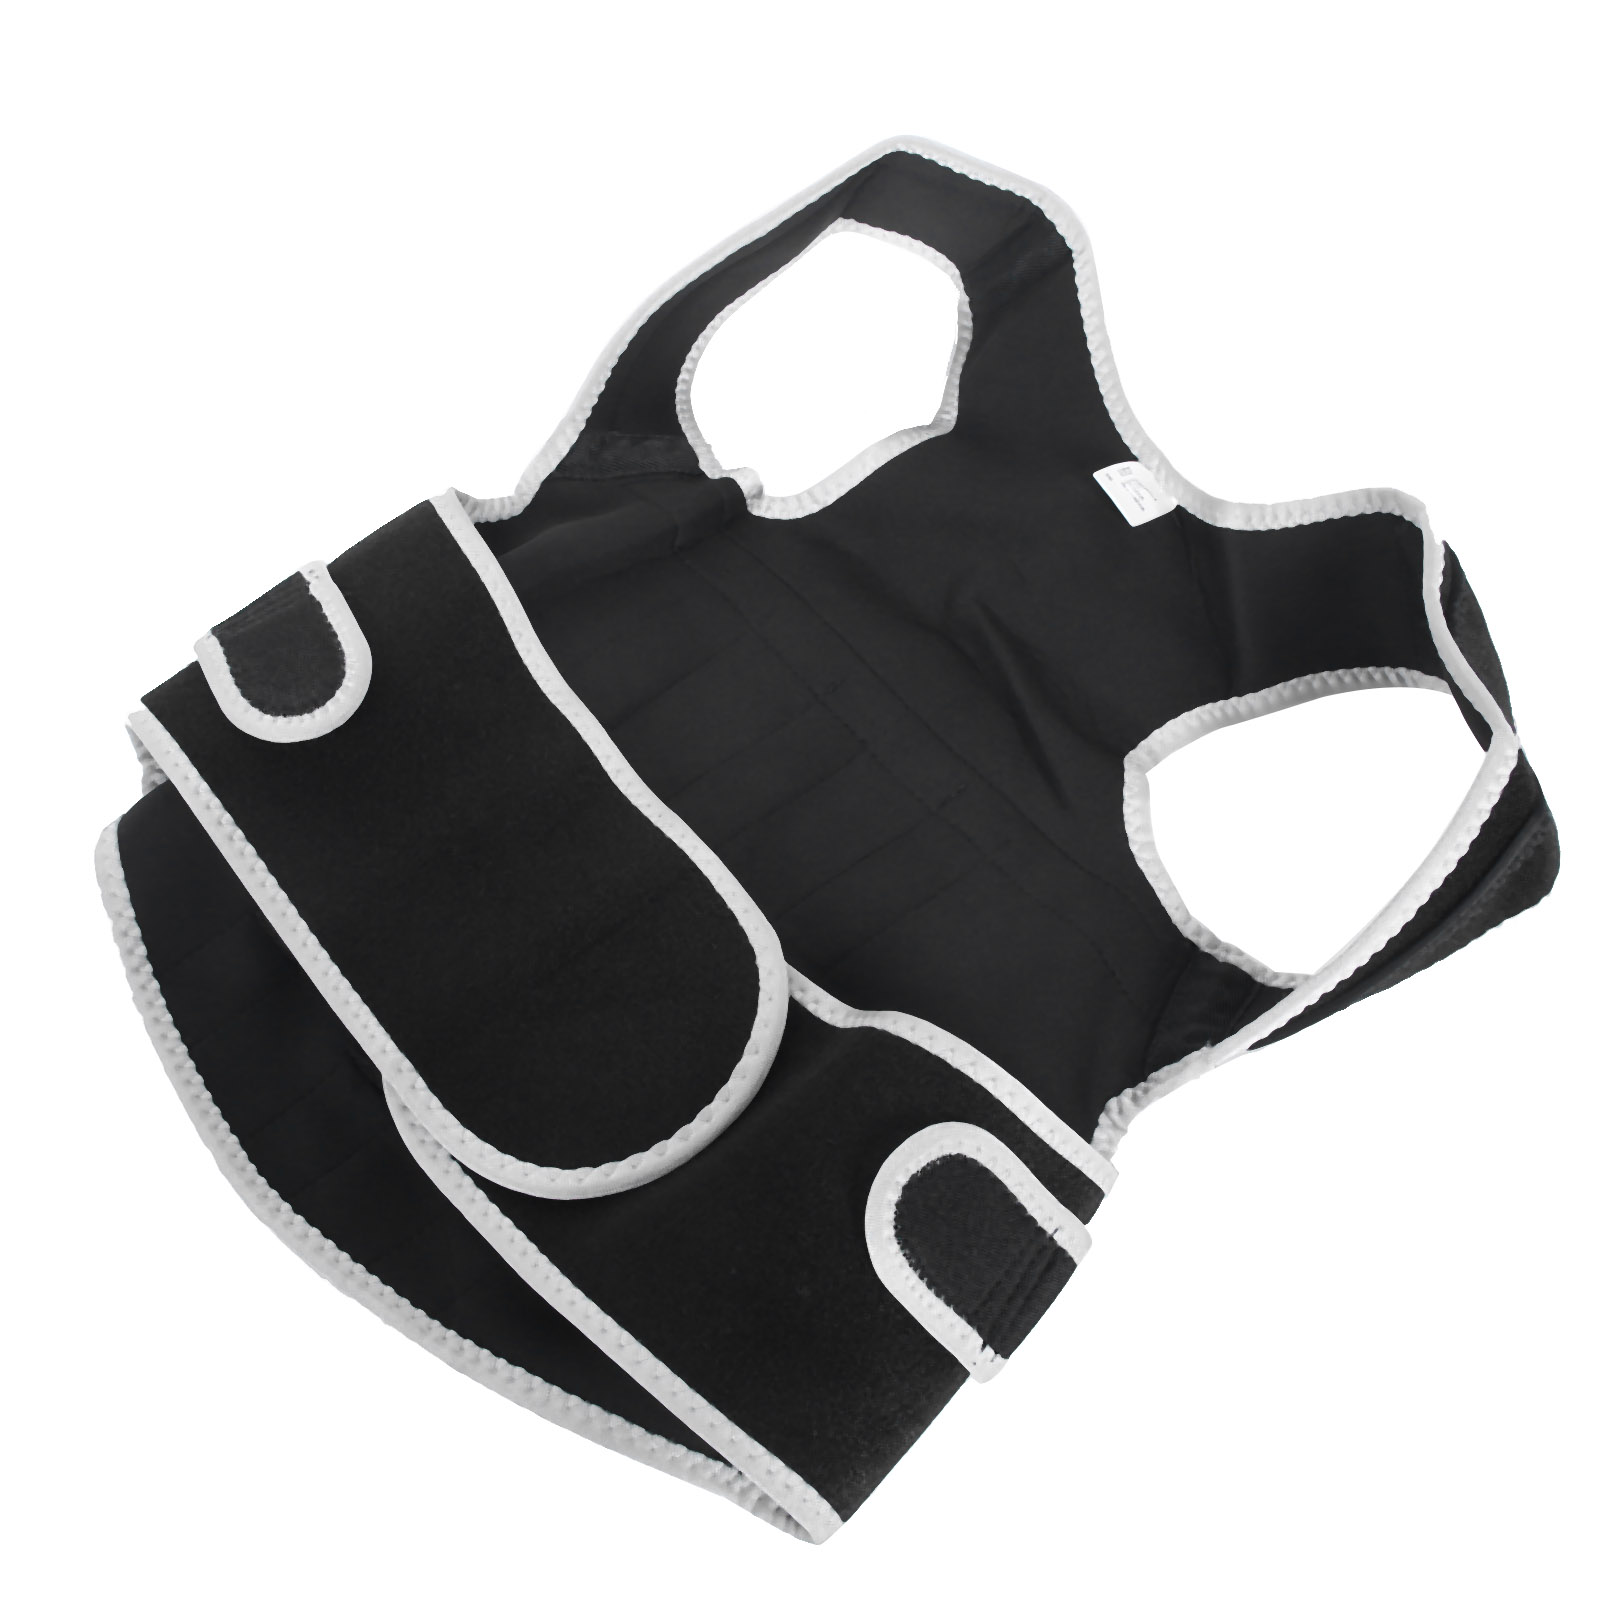 Posture-Corrector-Breathable-Back-Waist-Spine-Support-Belt-Brace-Straightener-GL thumbnail 14